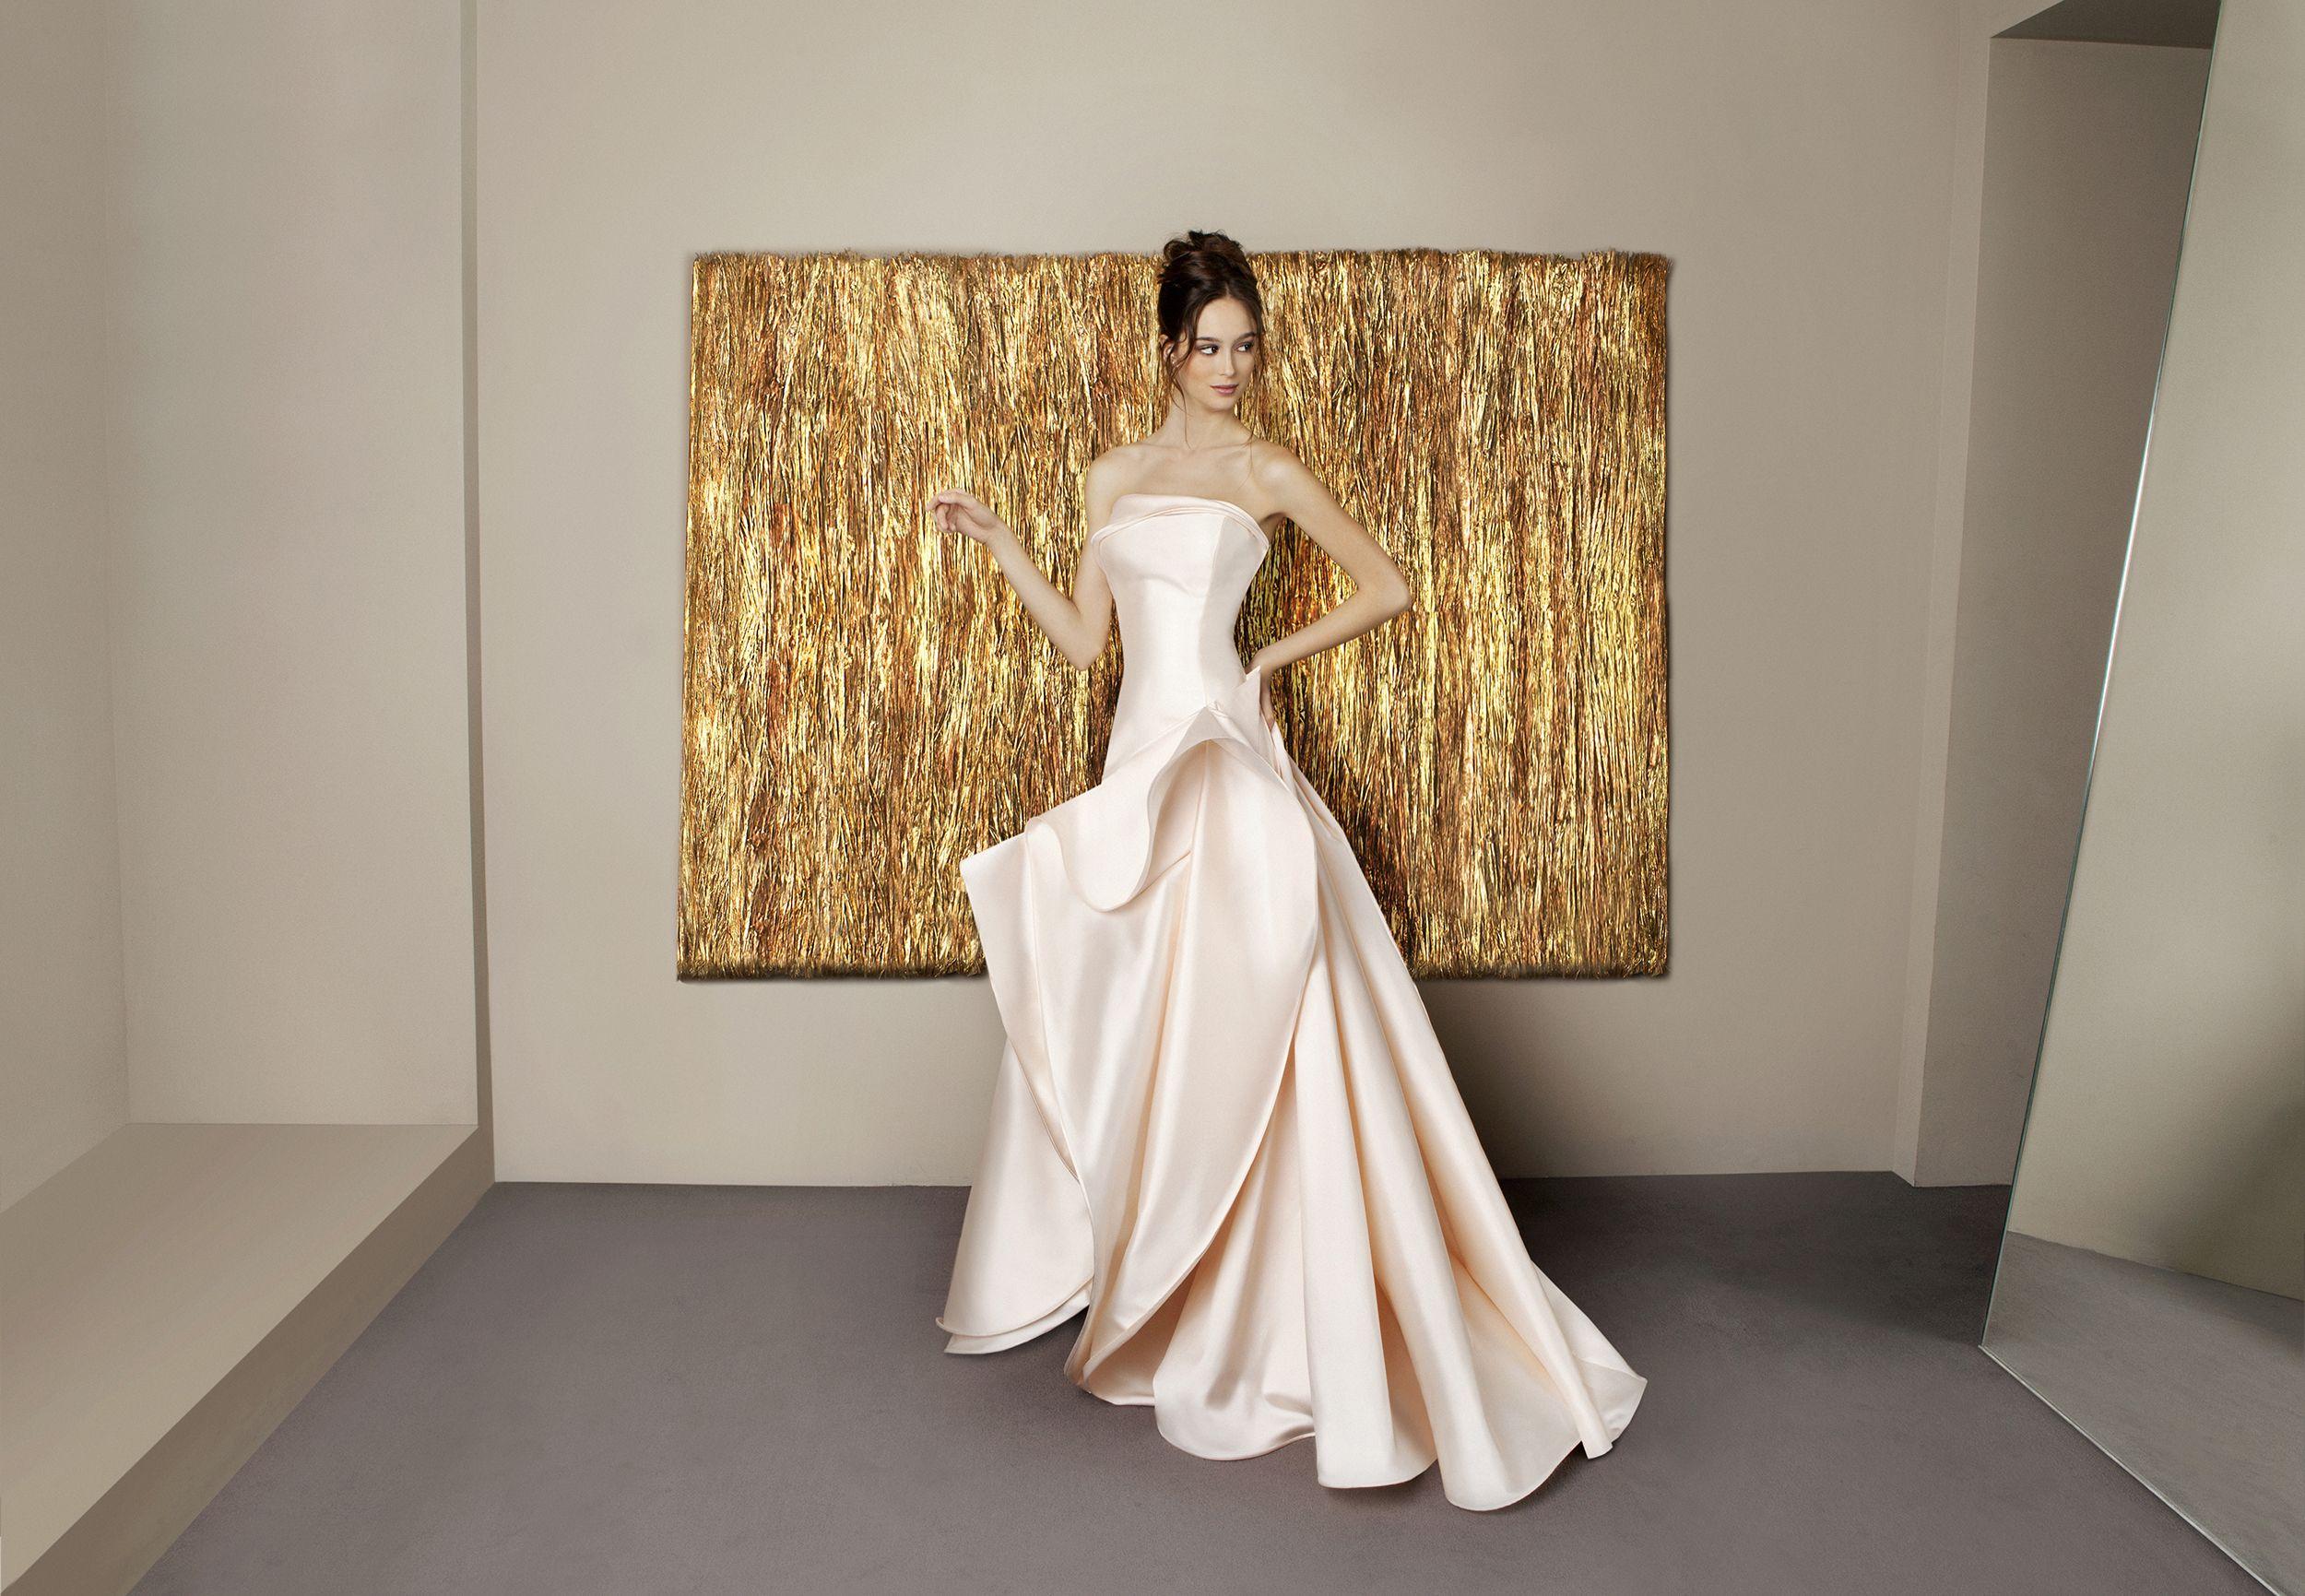 www.antonioriva.com #wedding #weddingdress #madeinitaly #antonioriva #design #bridalfashion #modasposa #sposa #bride #dress #fashion #moda #collezionisposa #matrimonio #nozze